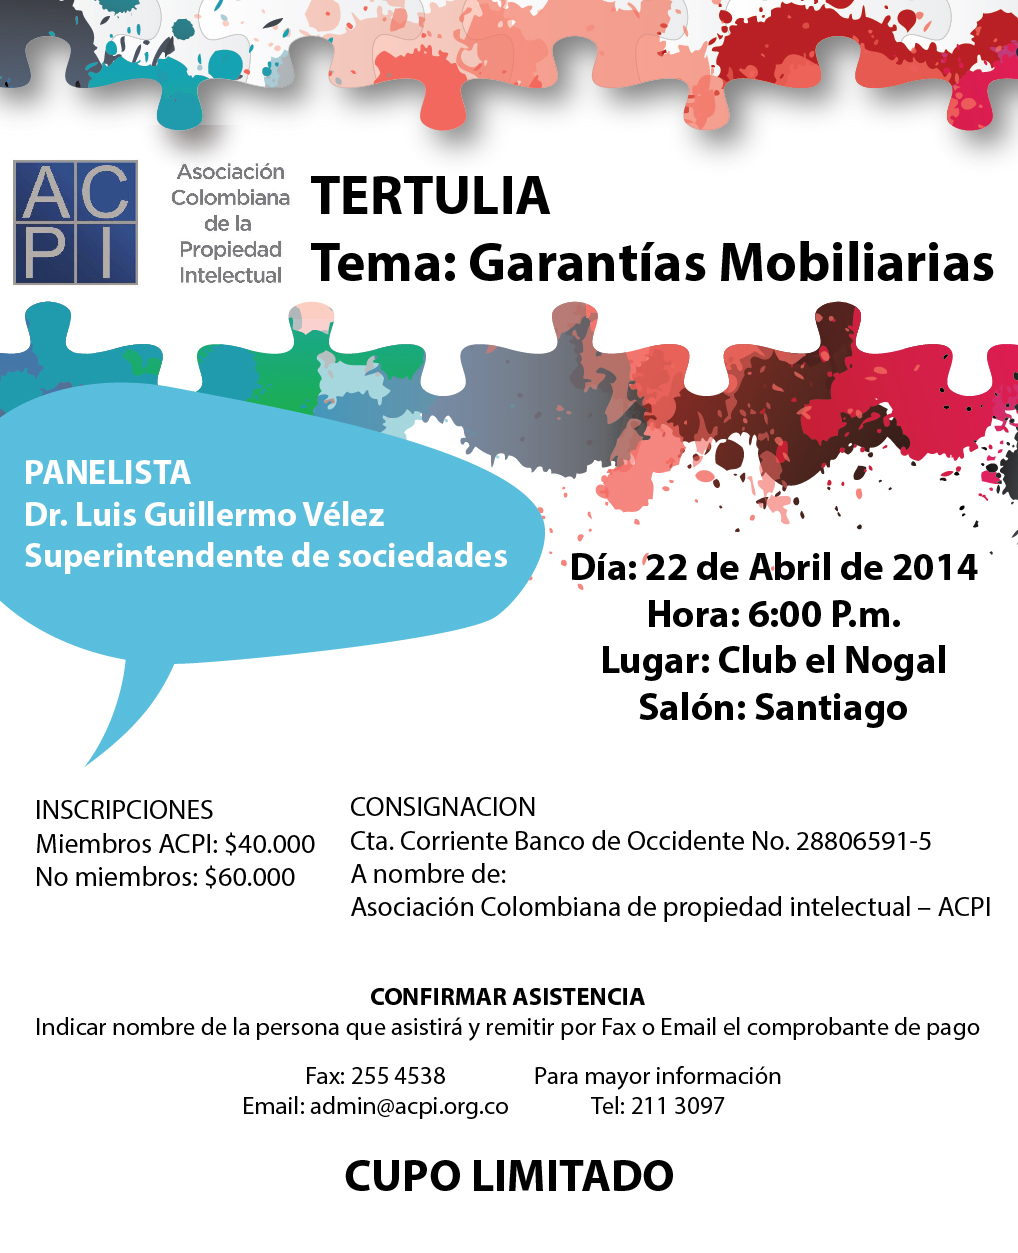 Acpi Invita: Tertulia sobre Garantías Mobiliarias